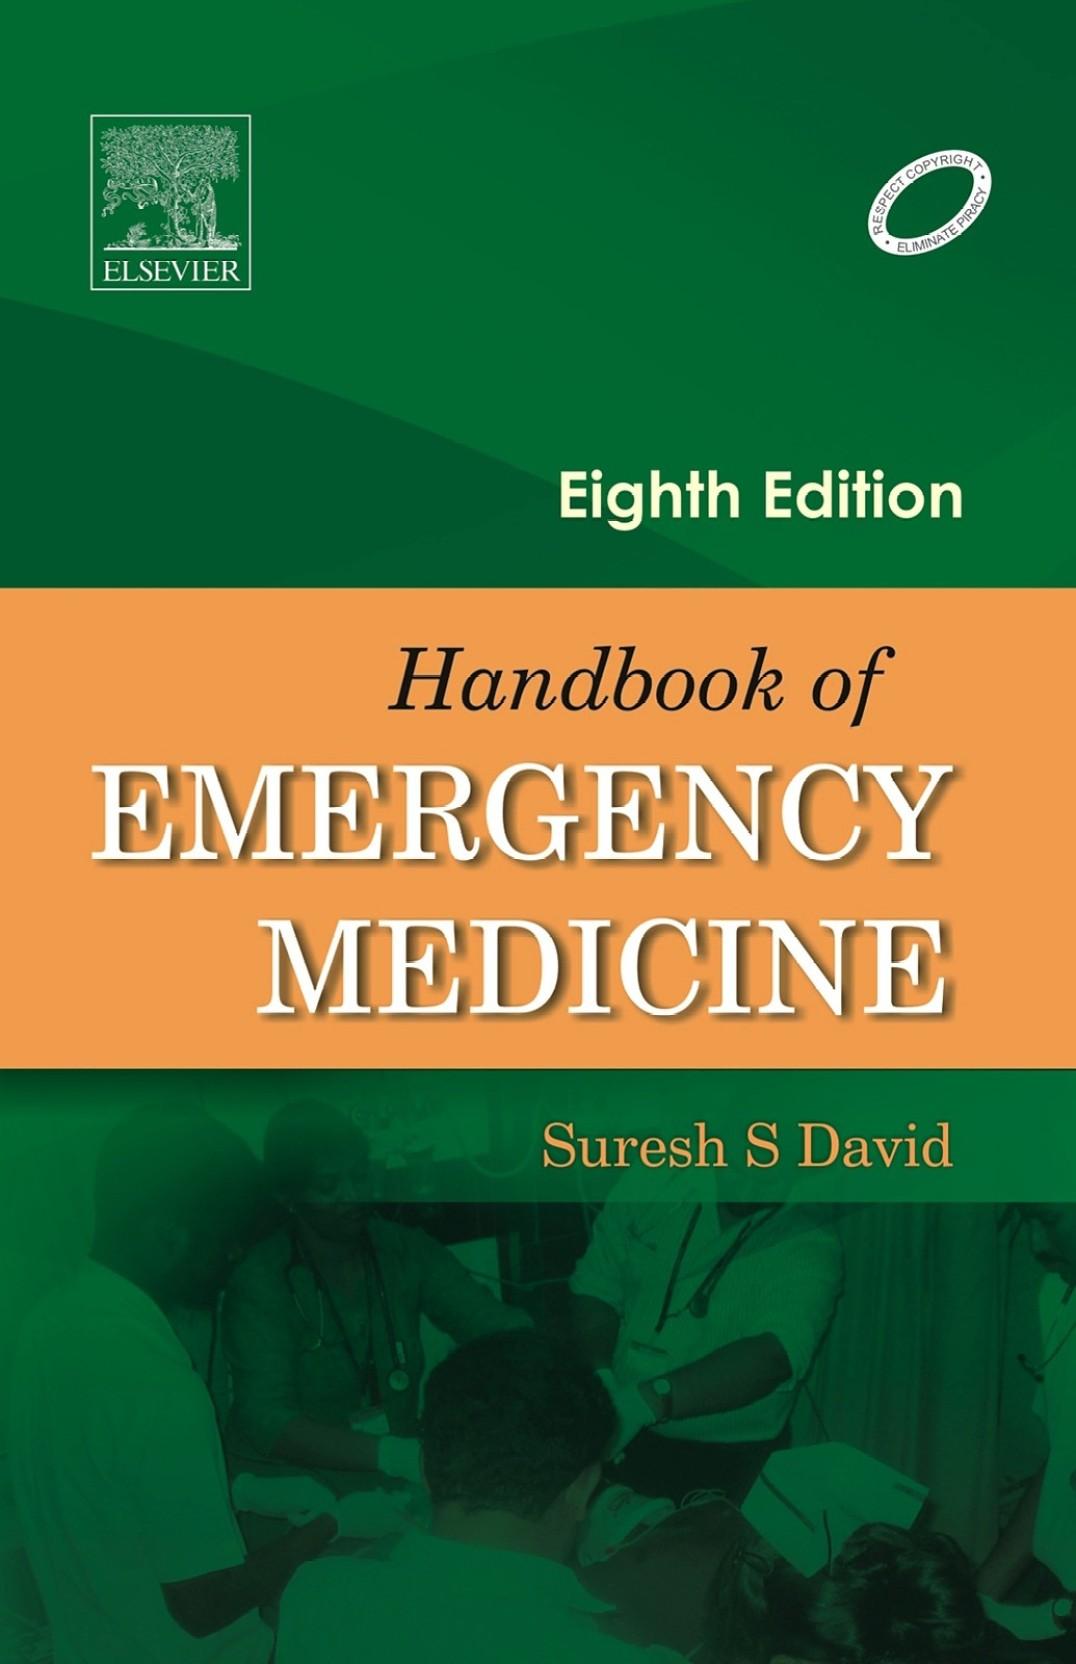 Handbook of Emergency Medicine 8th Edition. ADD TO CART